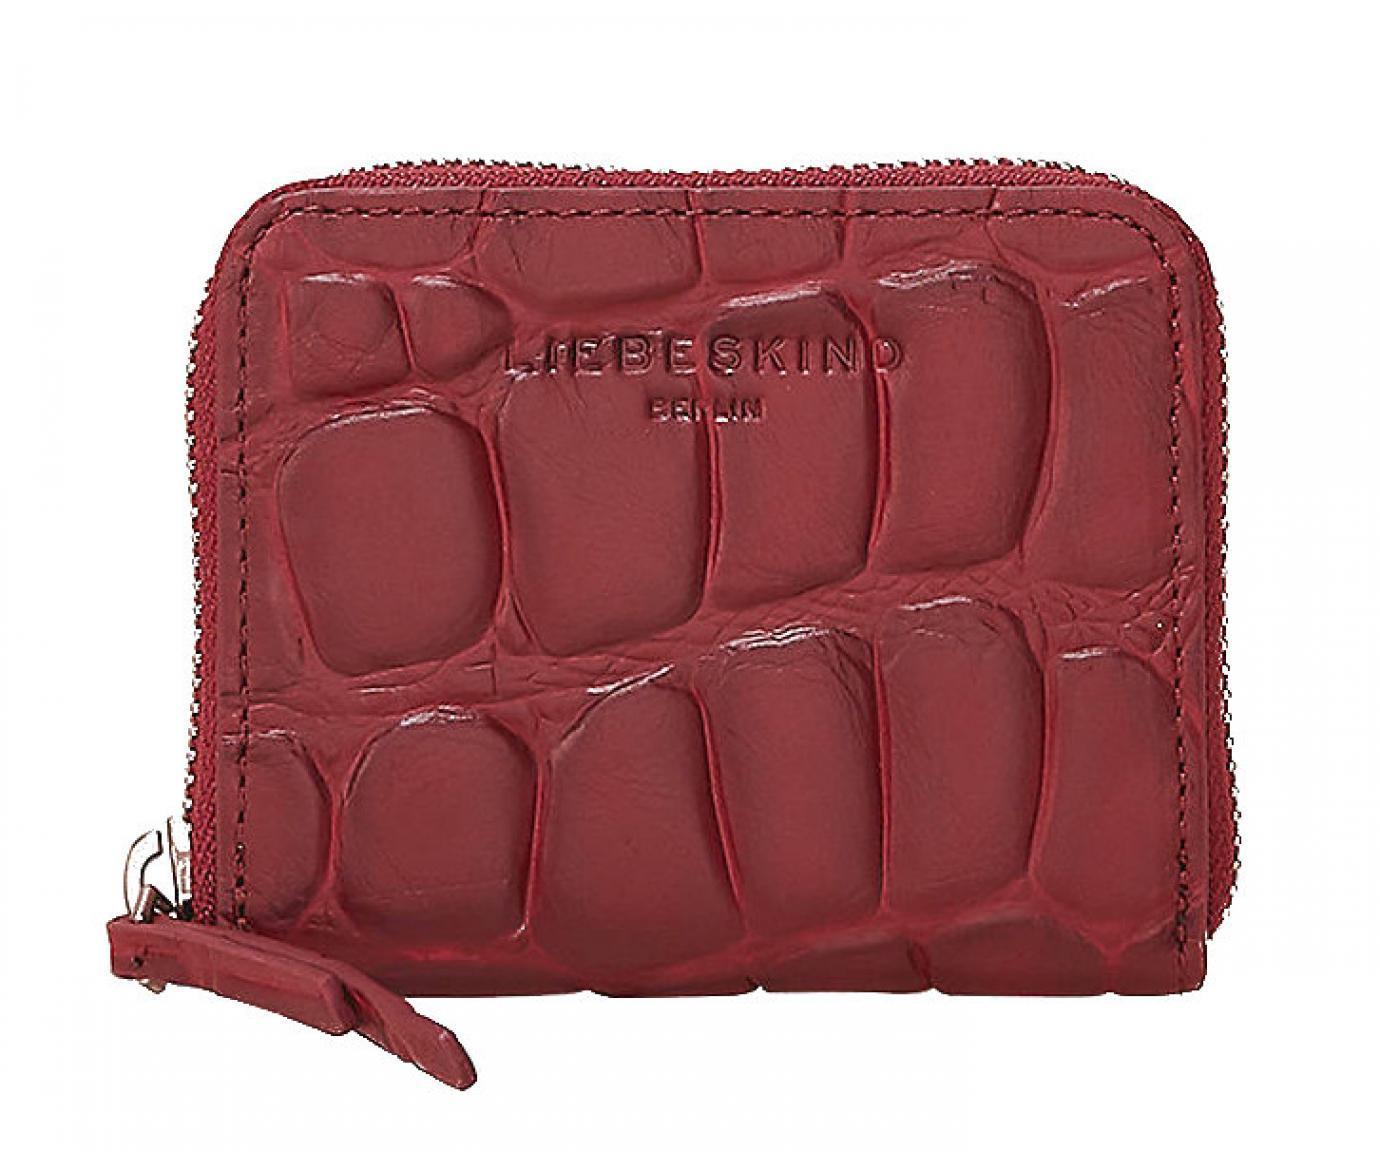 Liebeskind Portmonee Etui Zip Leder DotW7 Big Croco Rot